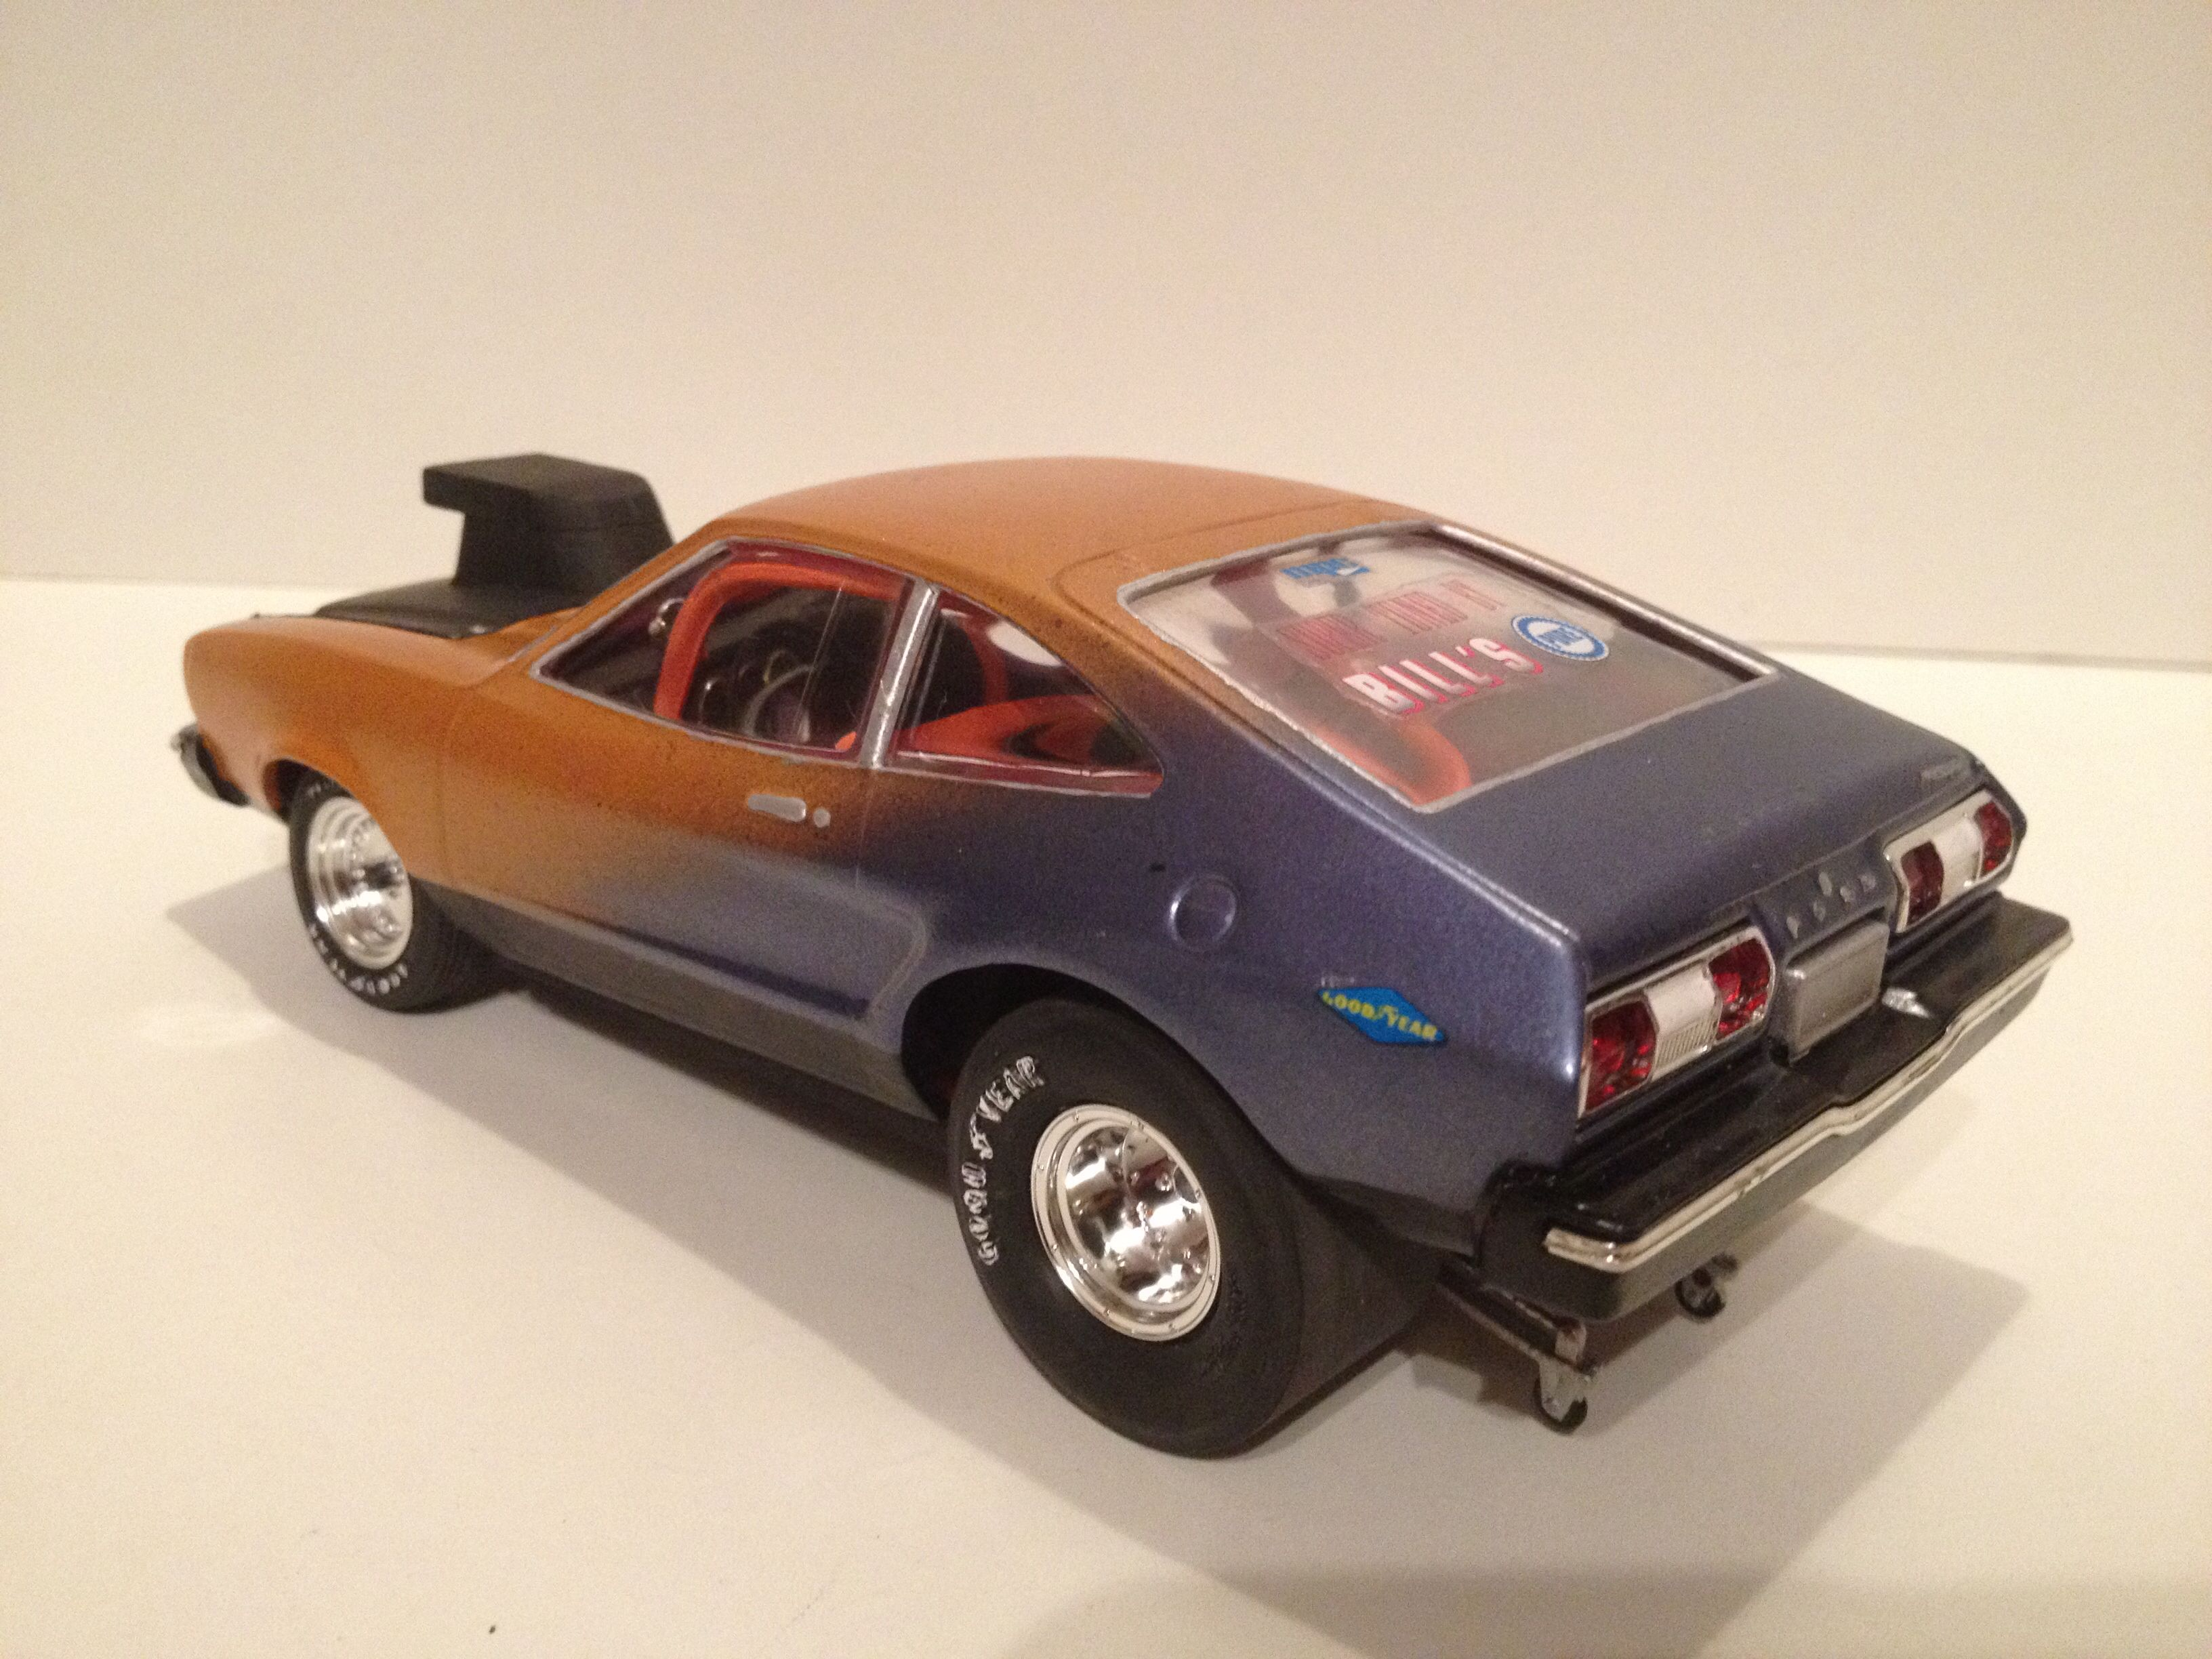 Mpc mustang 2 | Model cars kits, Drag cars, Model kit